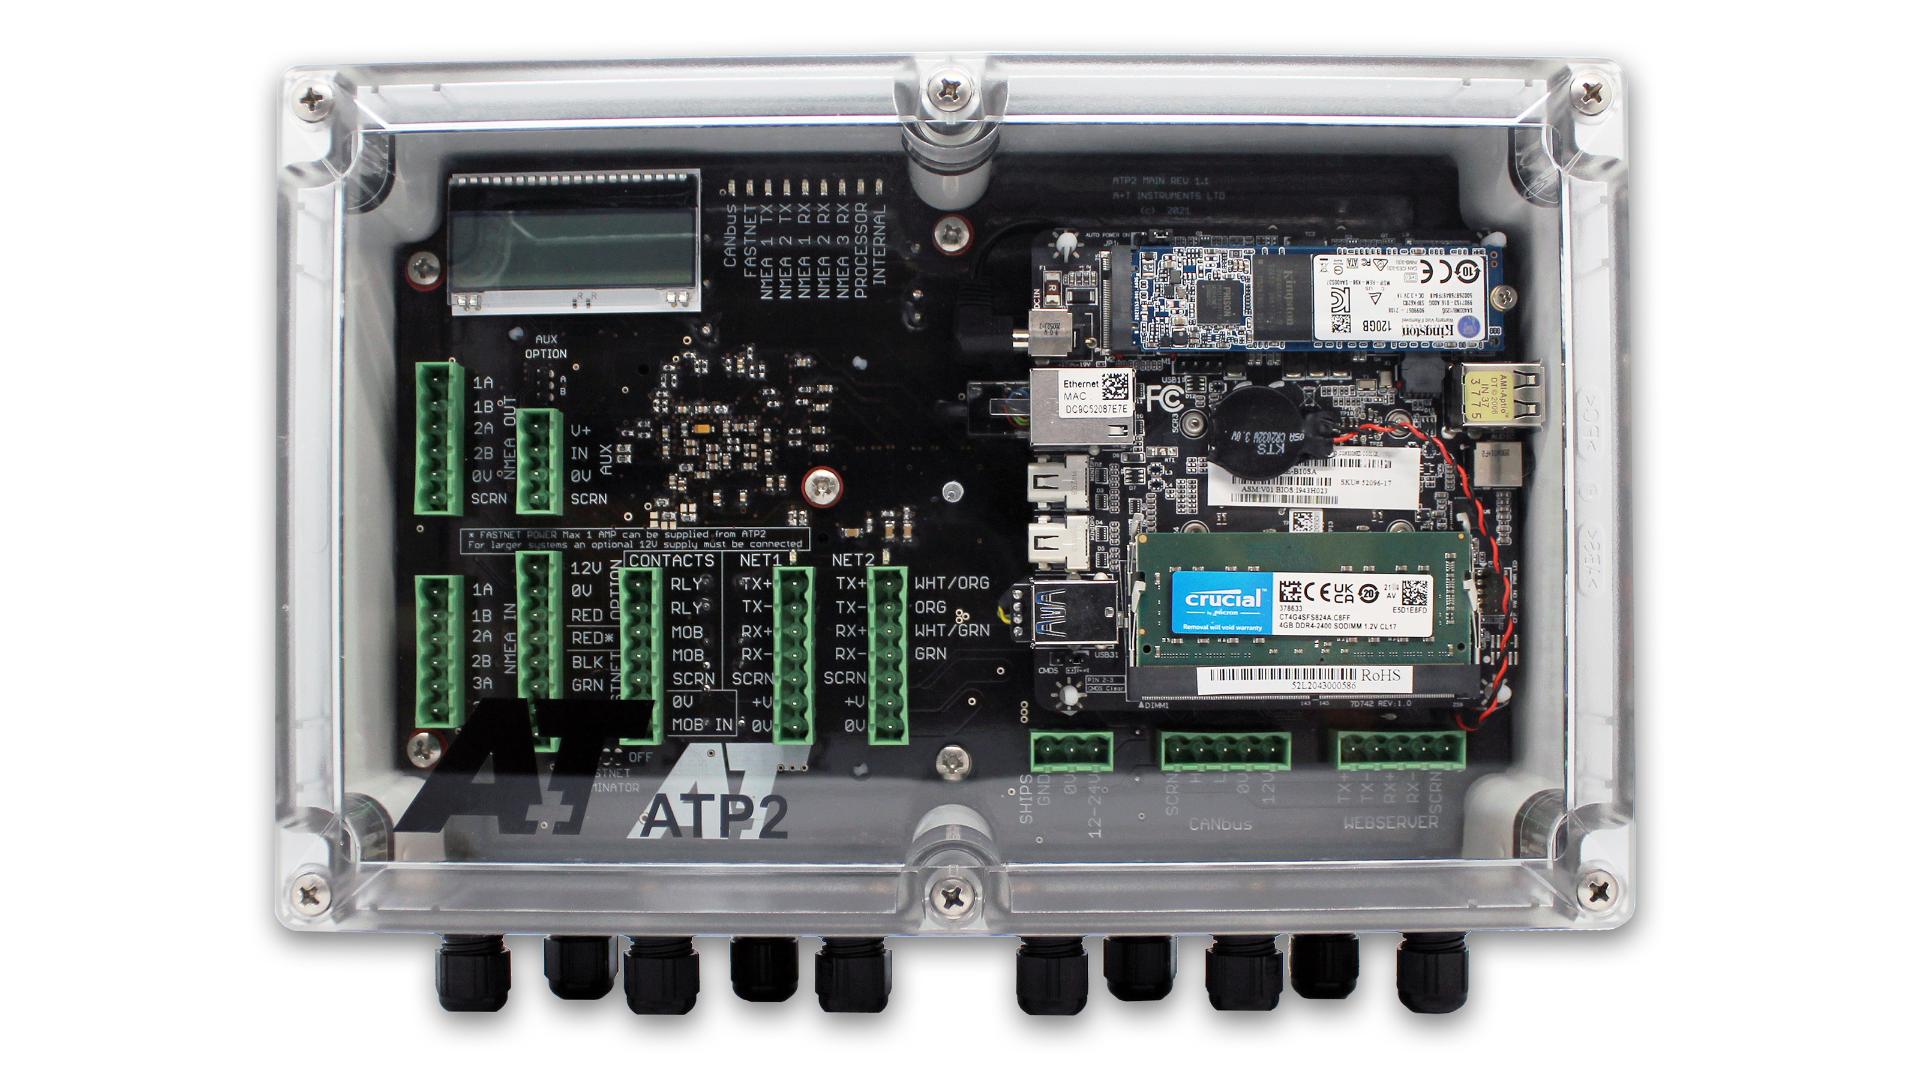 ATP2 A+T Sailing Electronics Sailing Instruments System